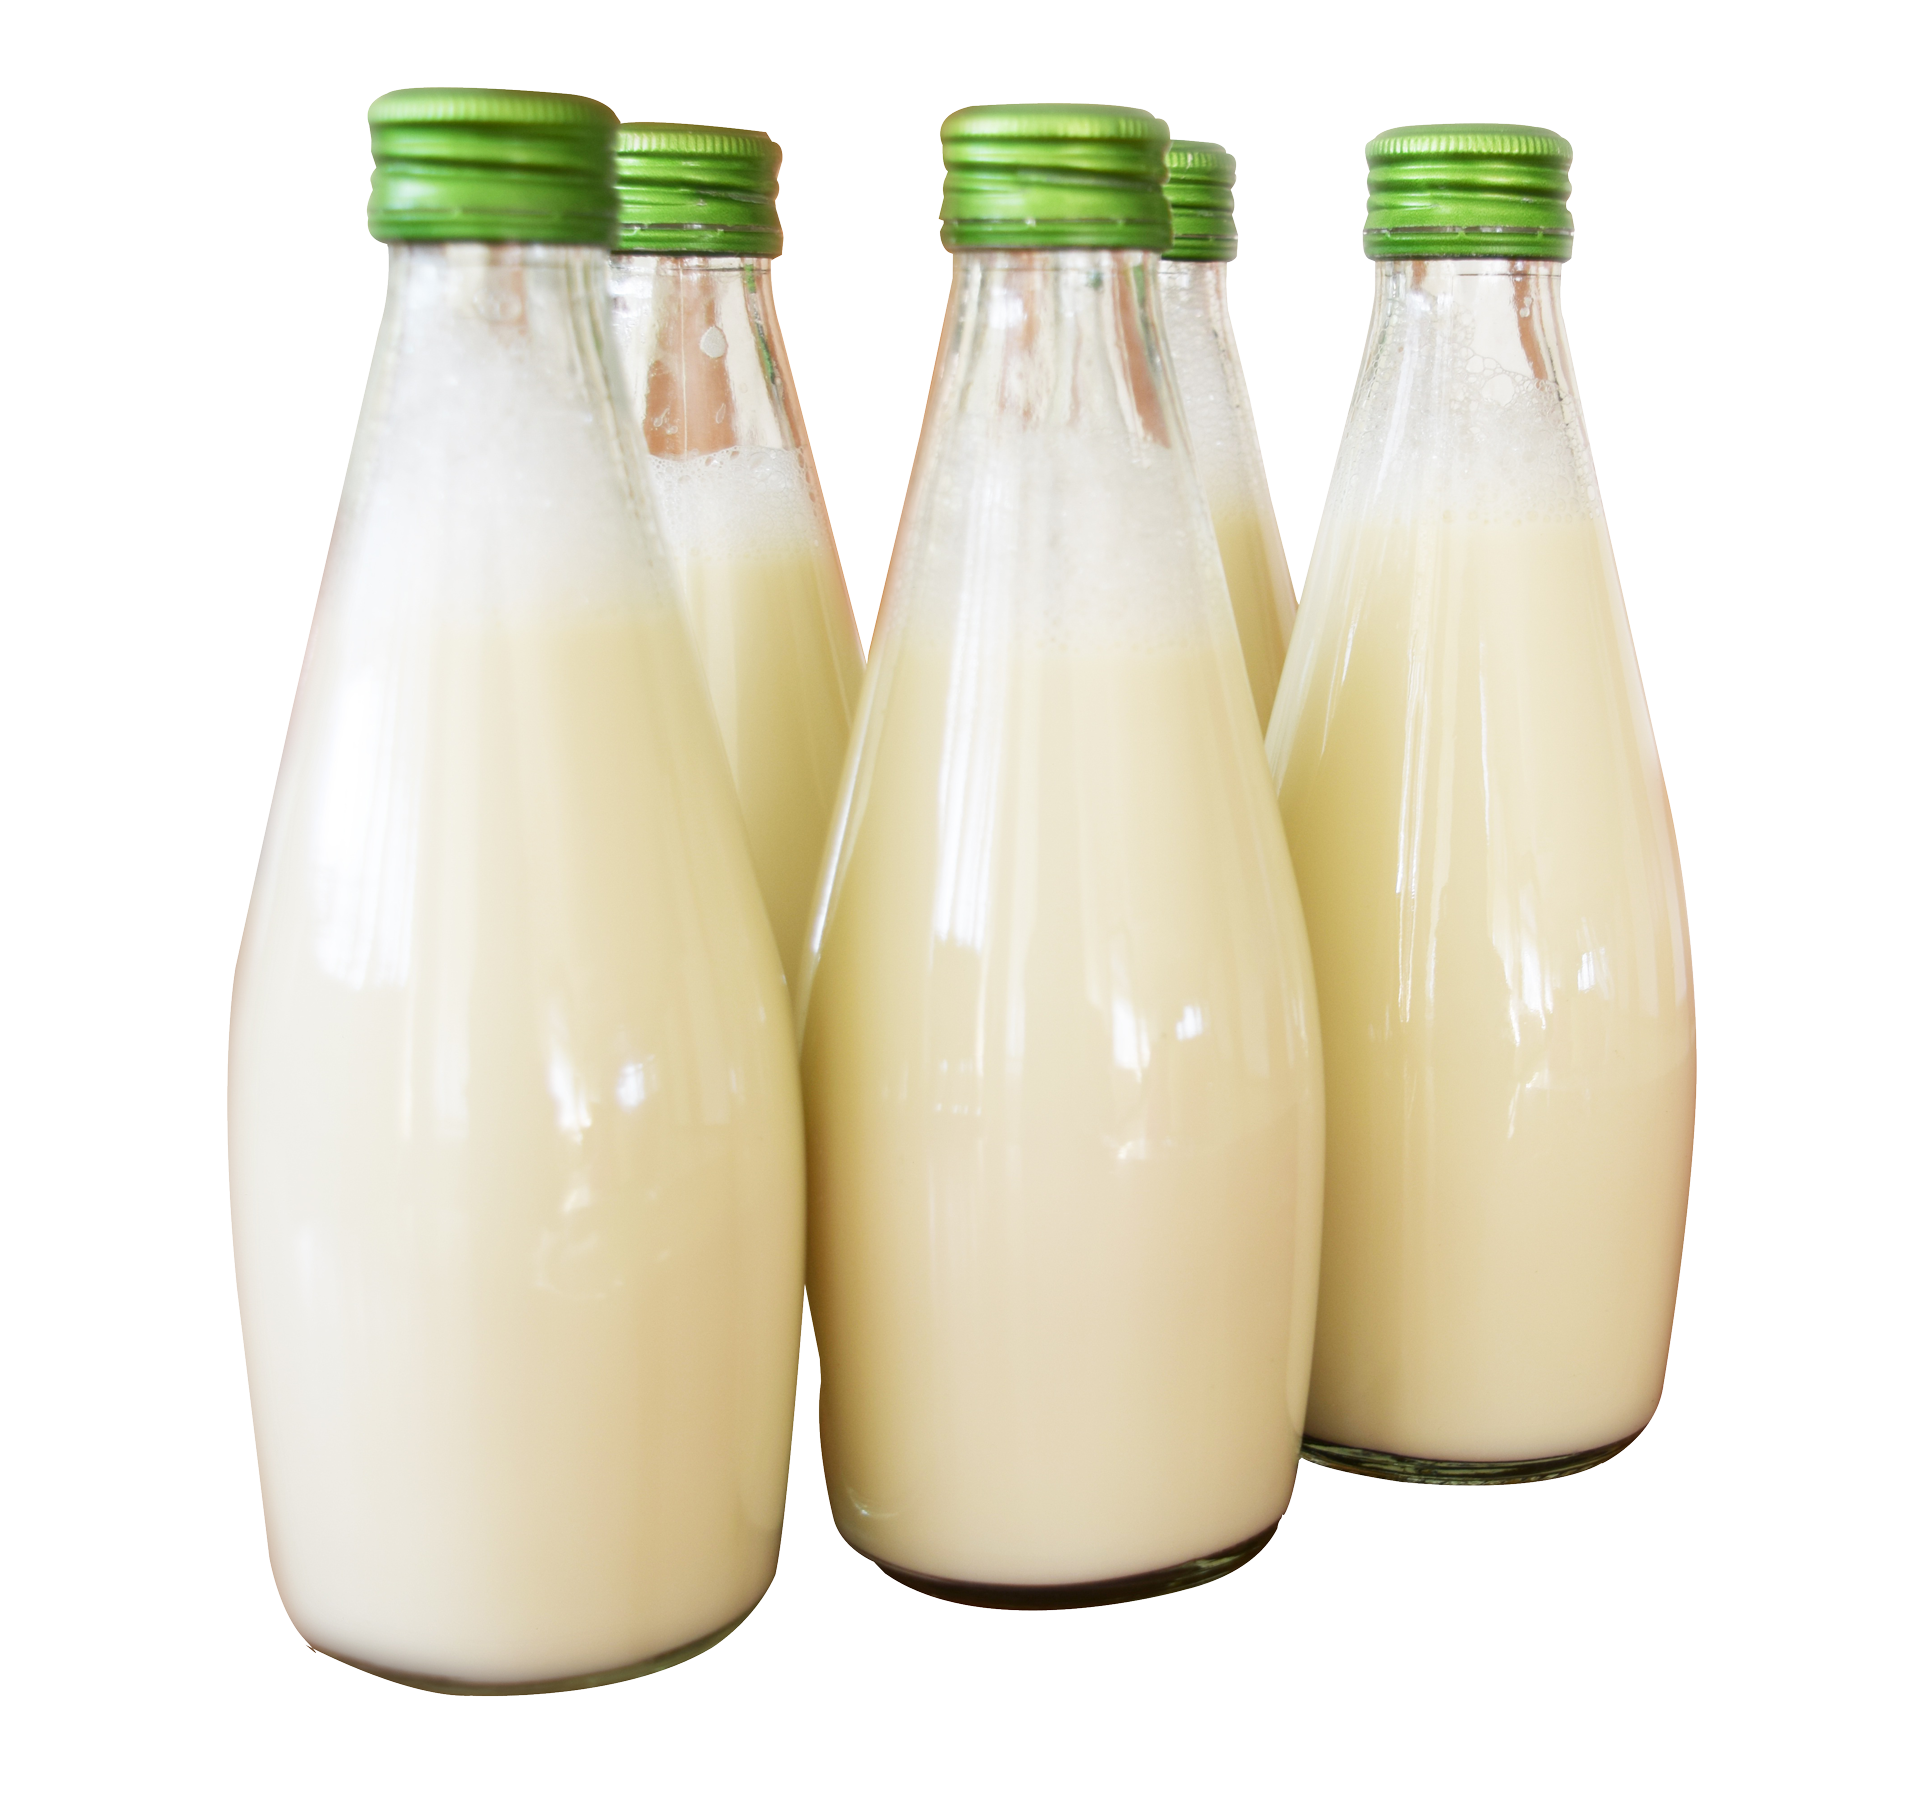 тому вуаль картинка бутылка молока на прозрачном фоне хороший номер, нас